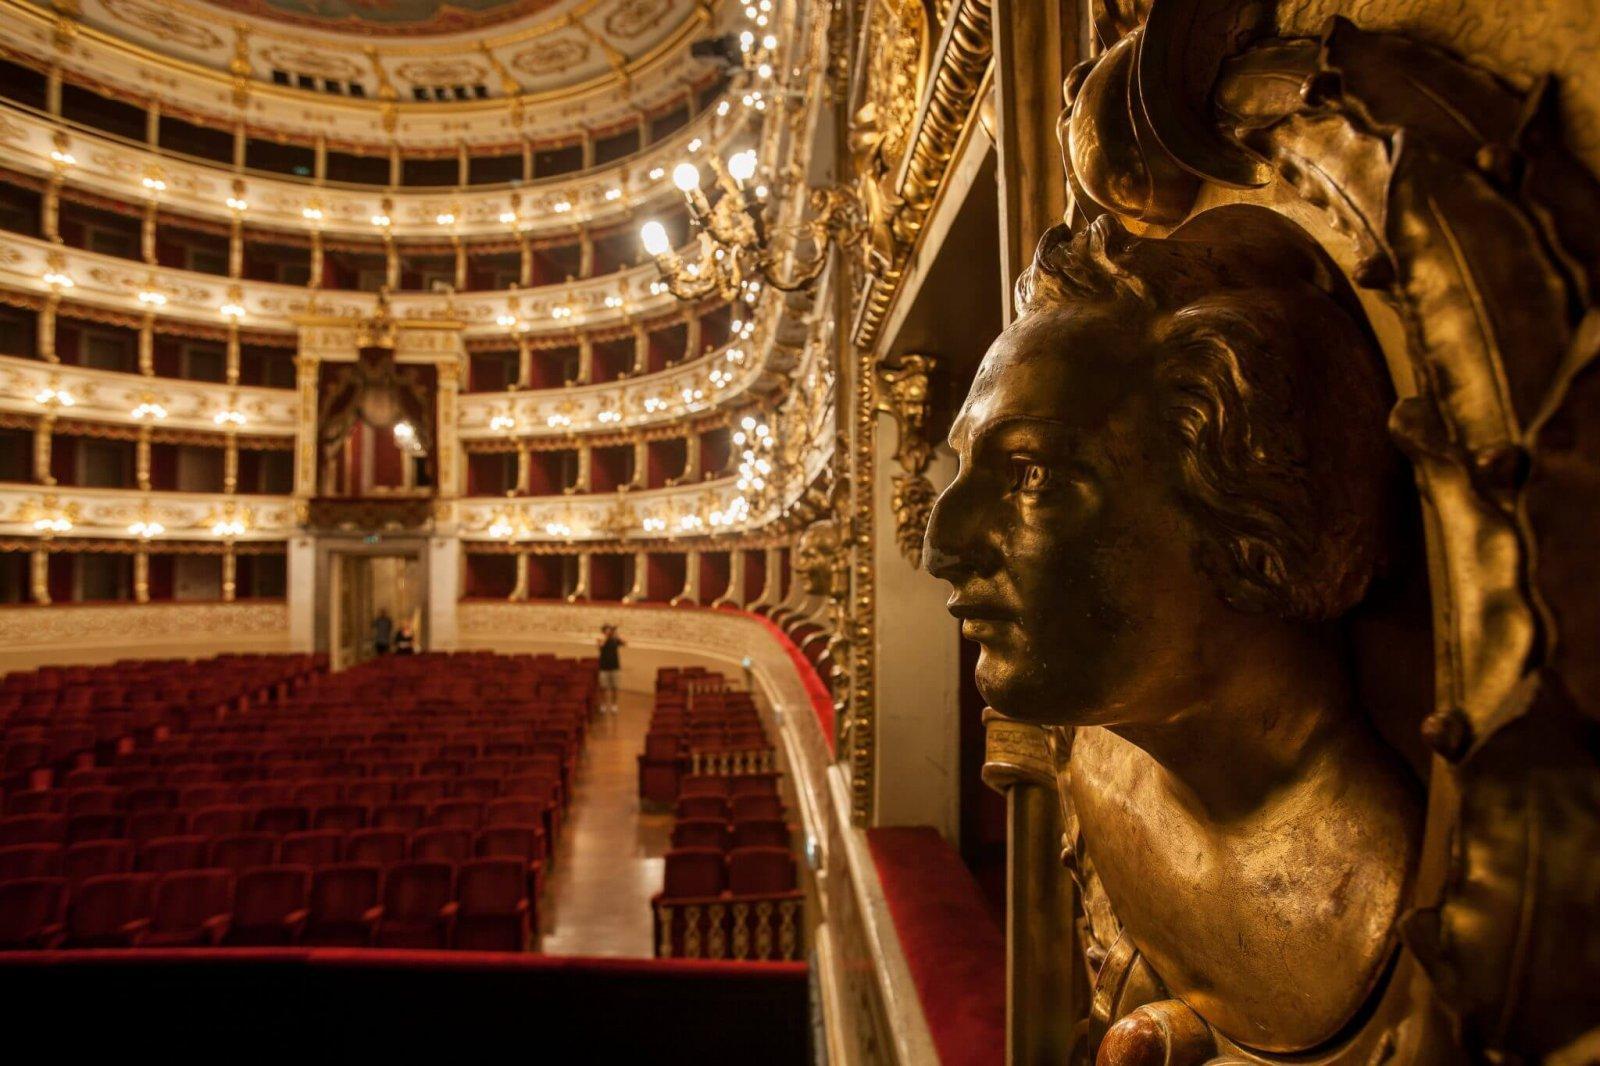 Teatro Regio di Parma - Interno